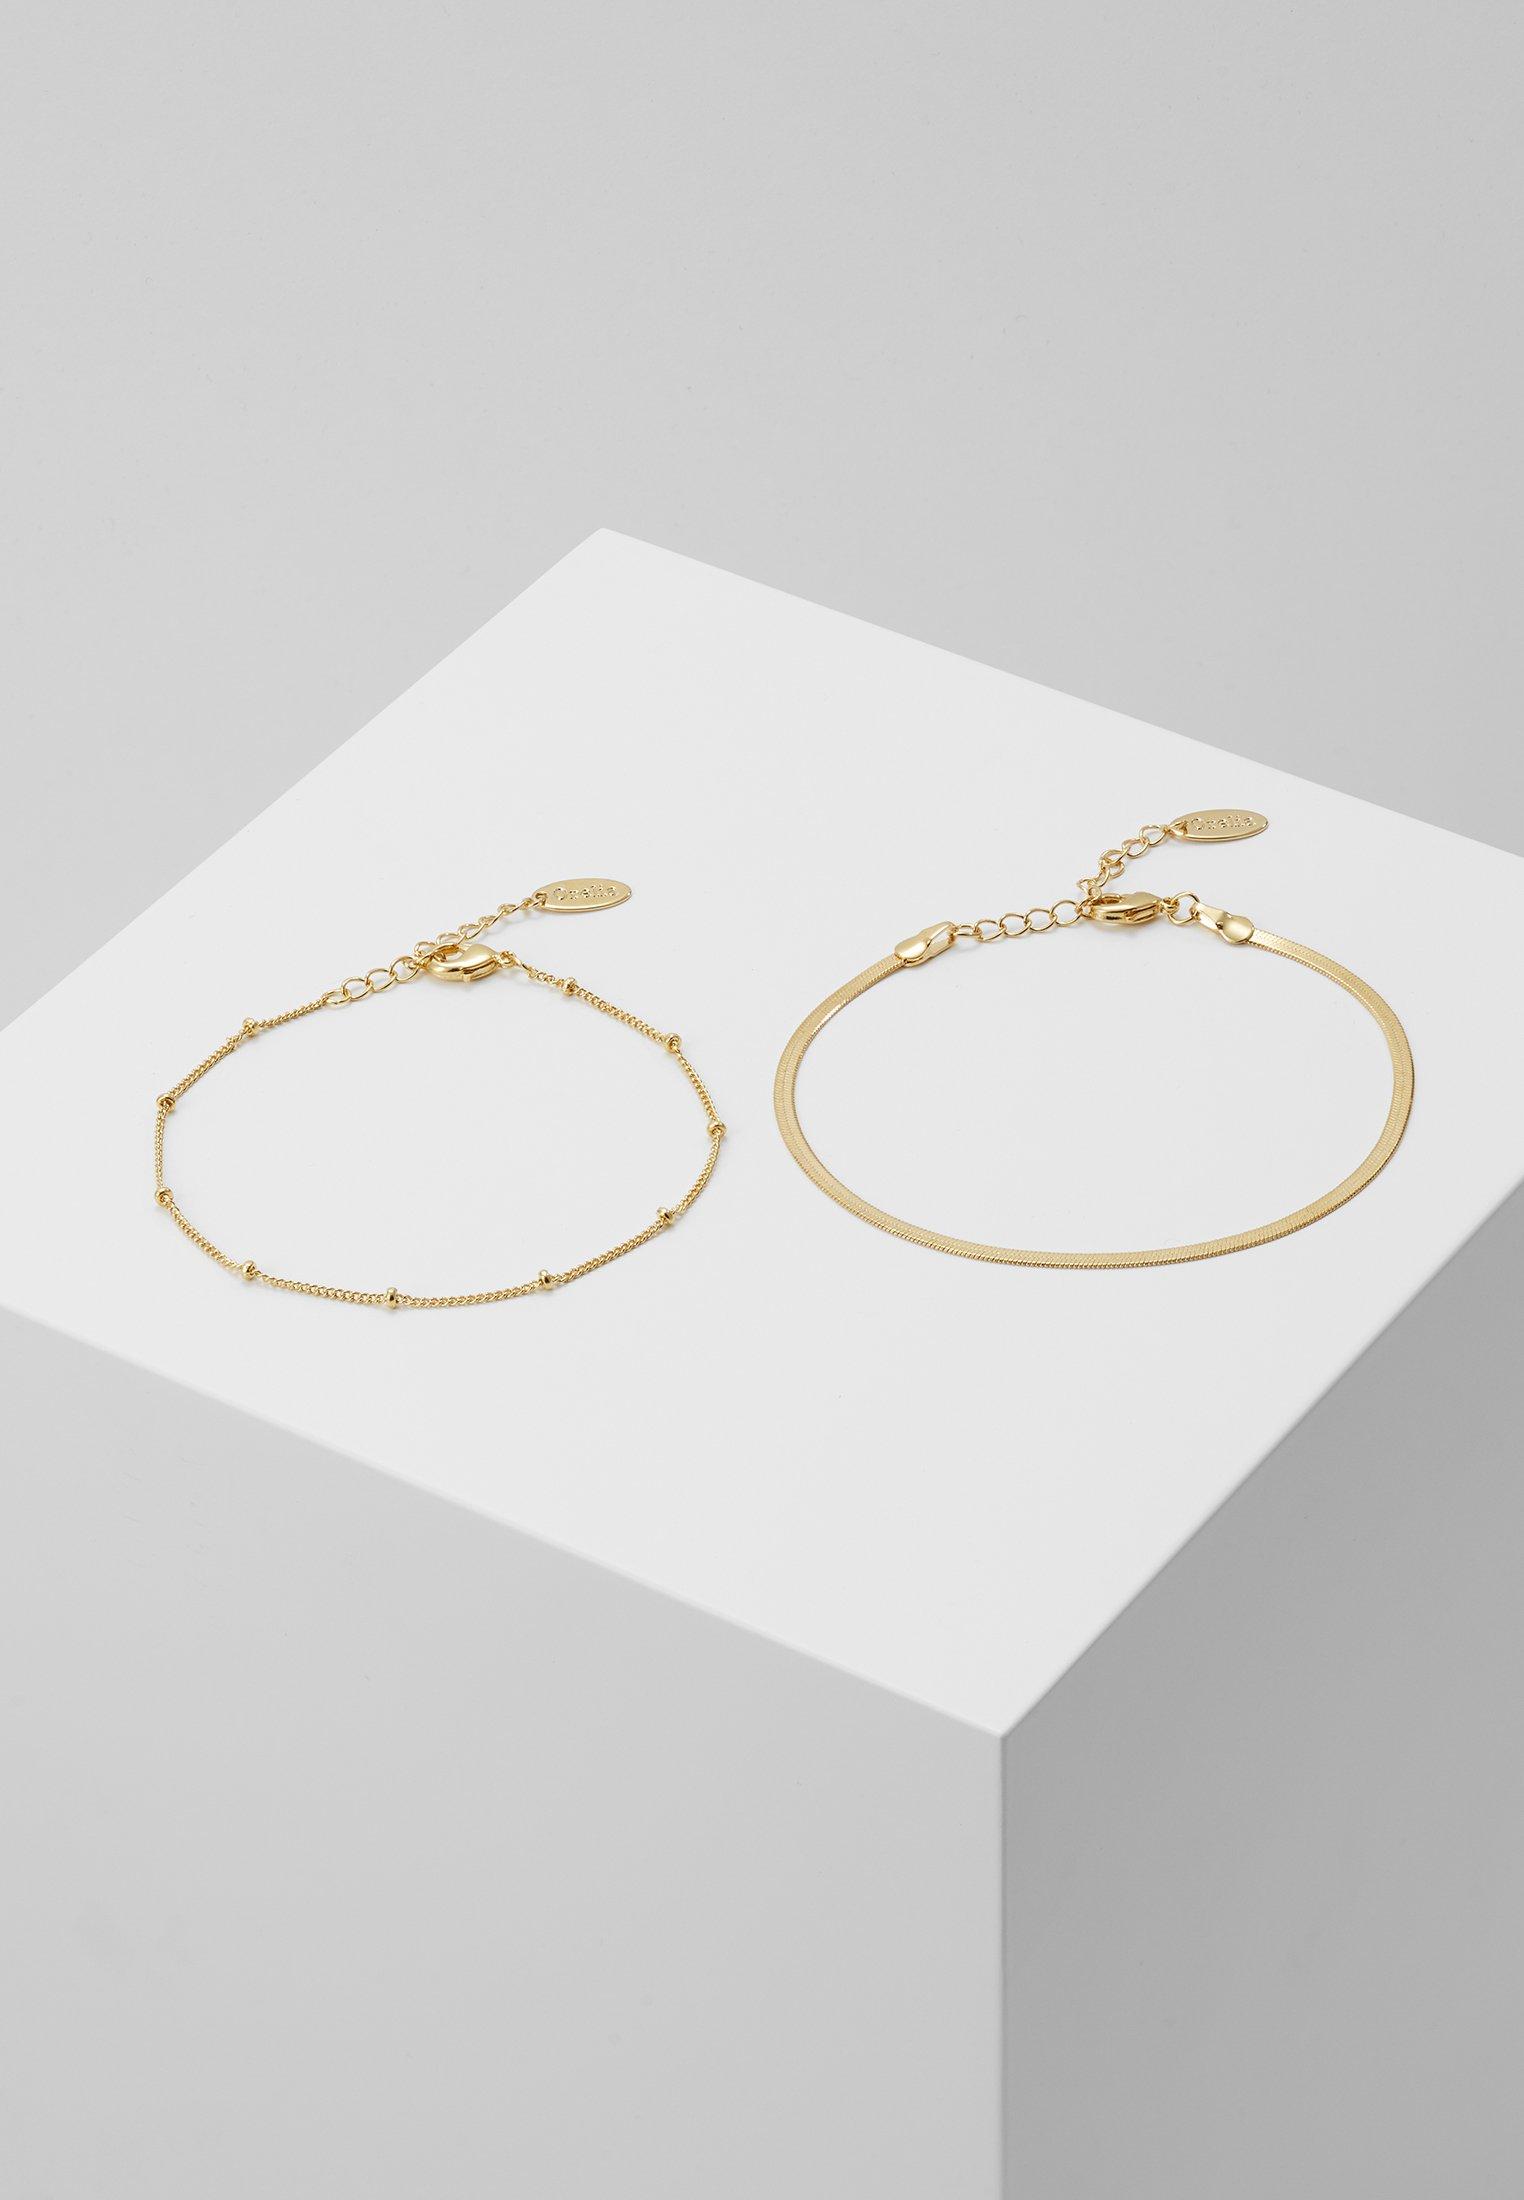 Femme SATELLITE AND FLAT CURB CHAIN BRACELET 2 PACK - Bracelet